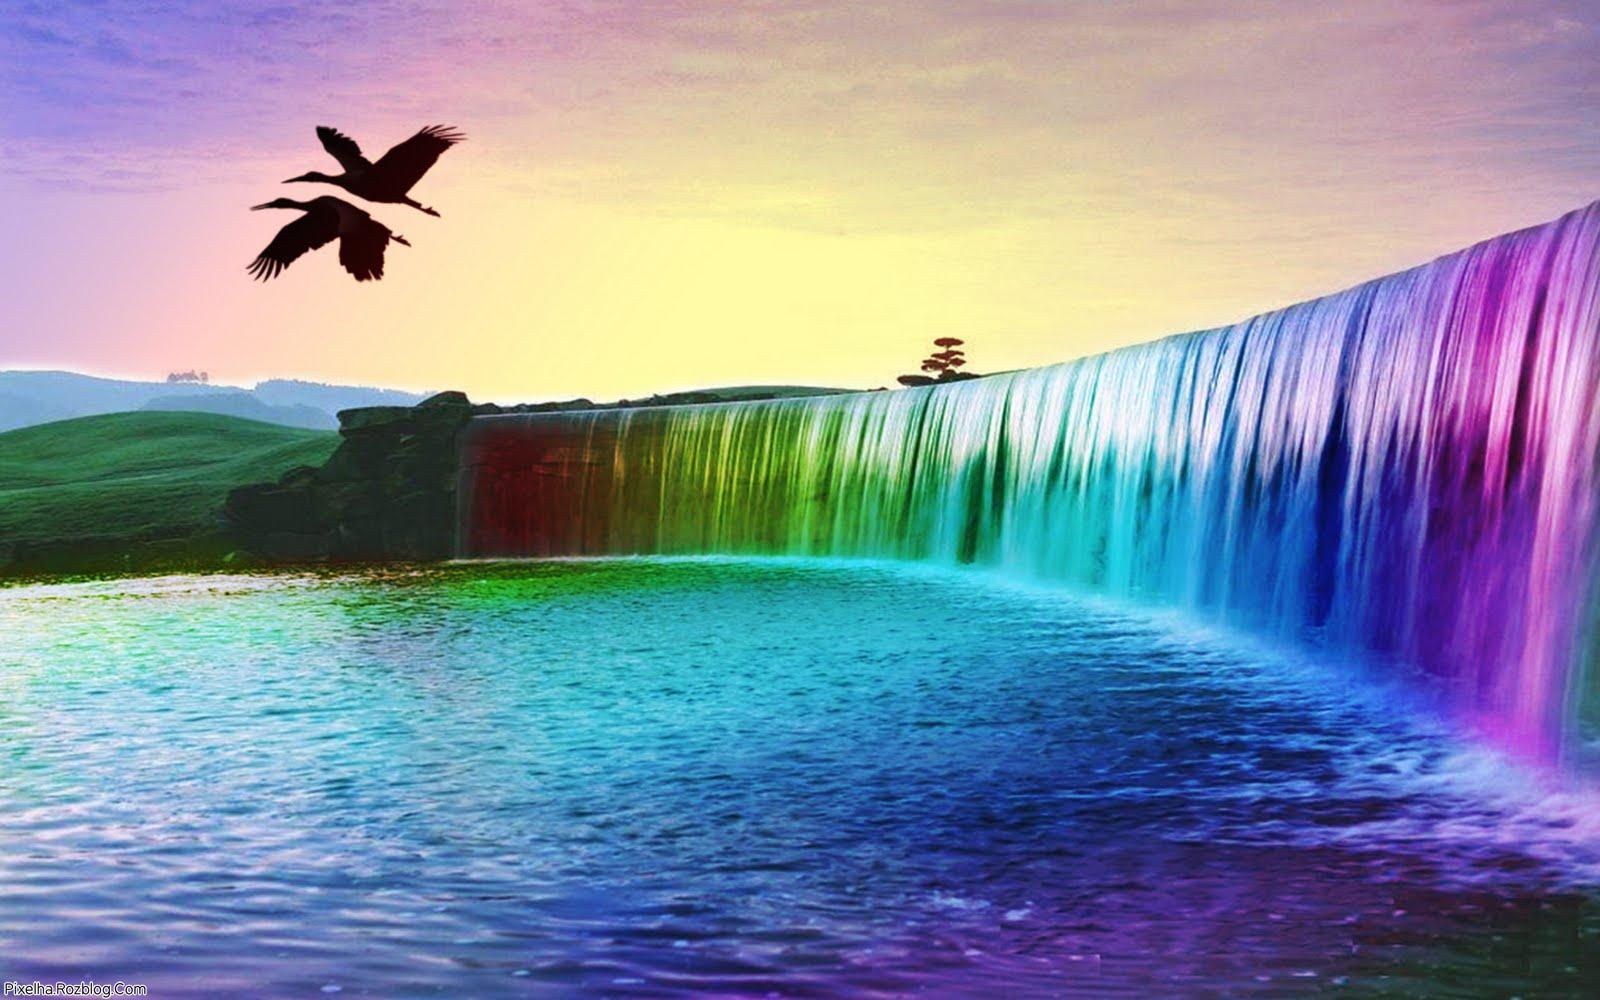 آبشار رنگین کمانی